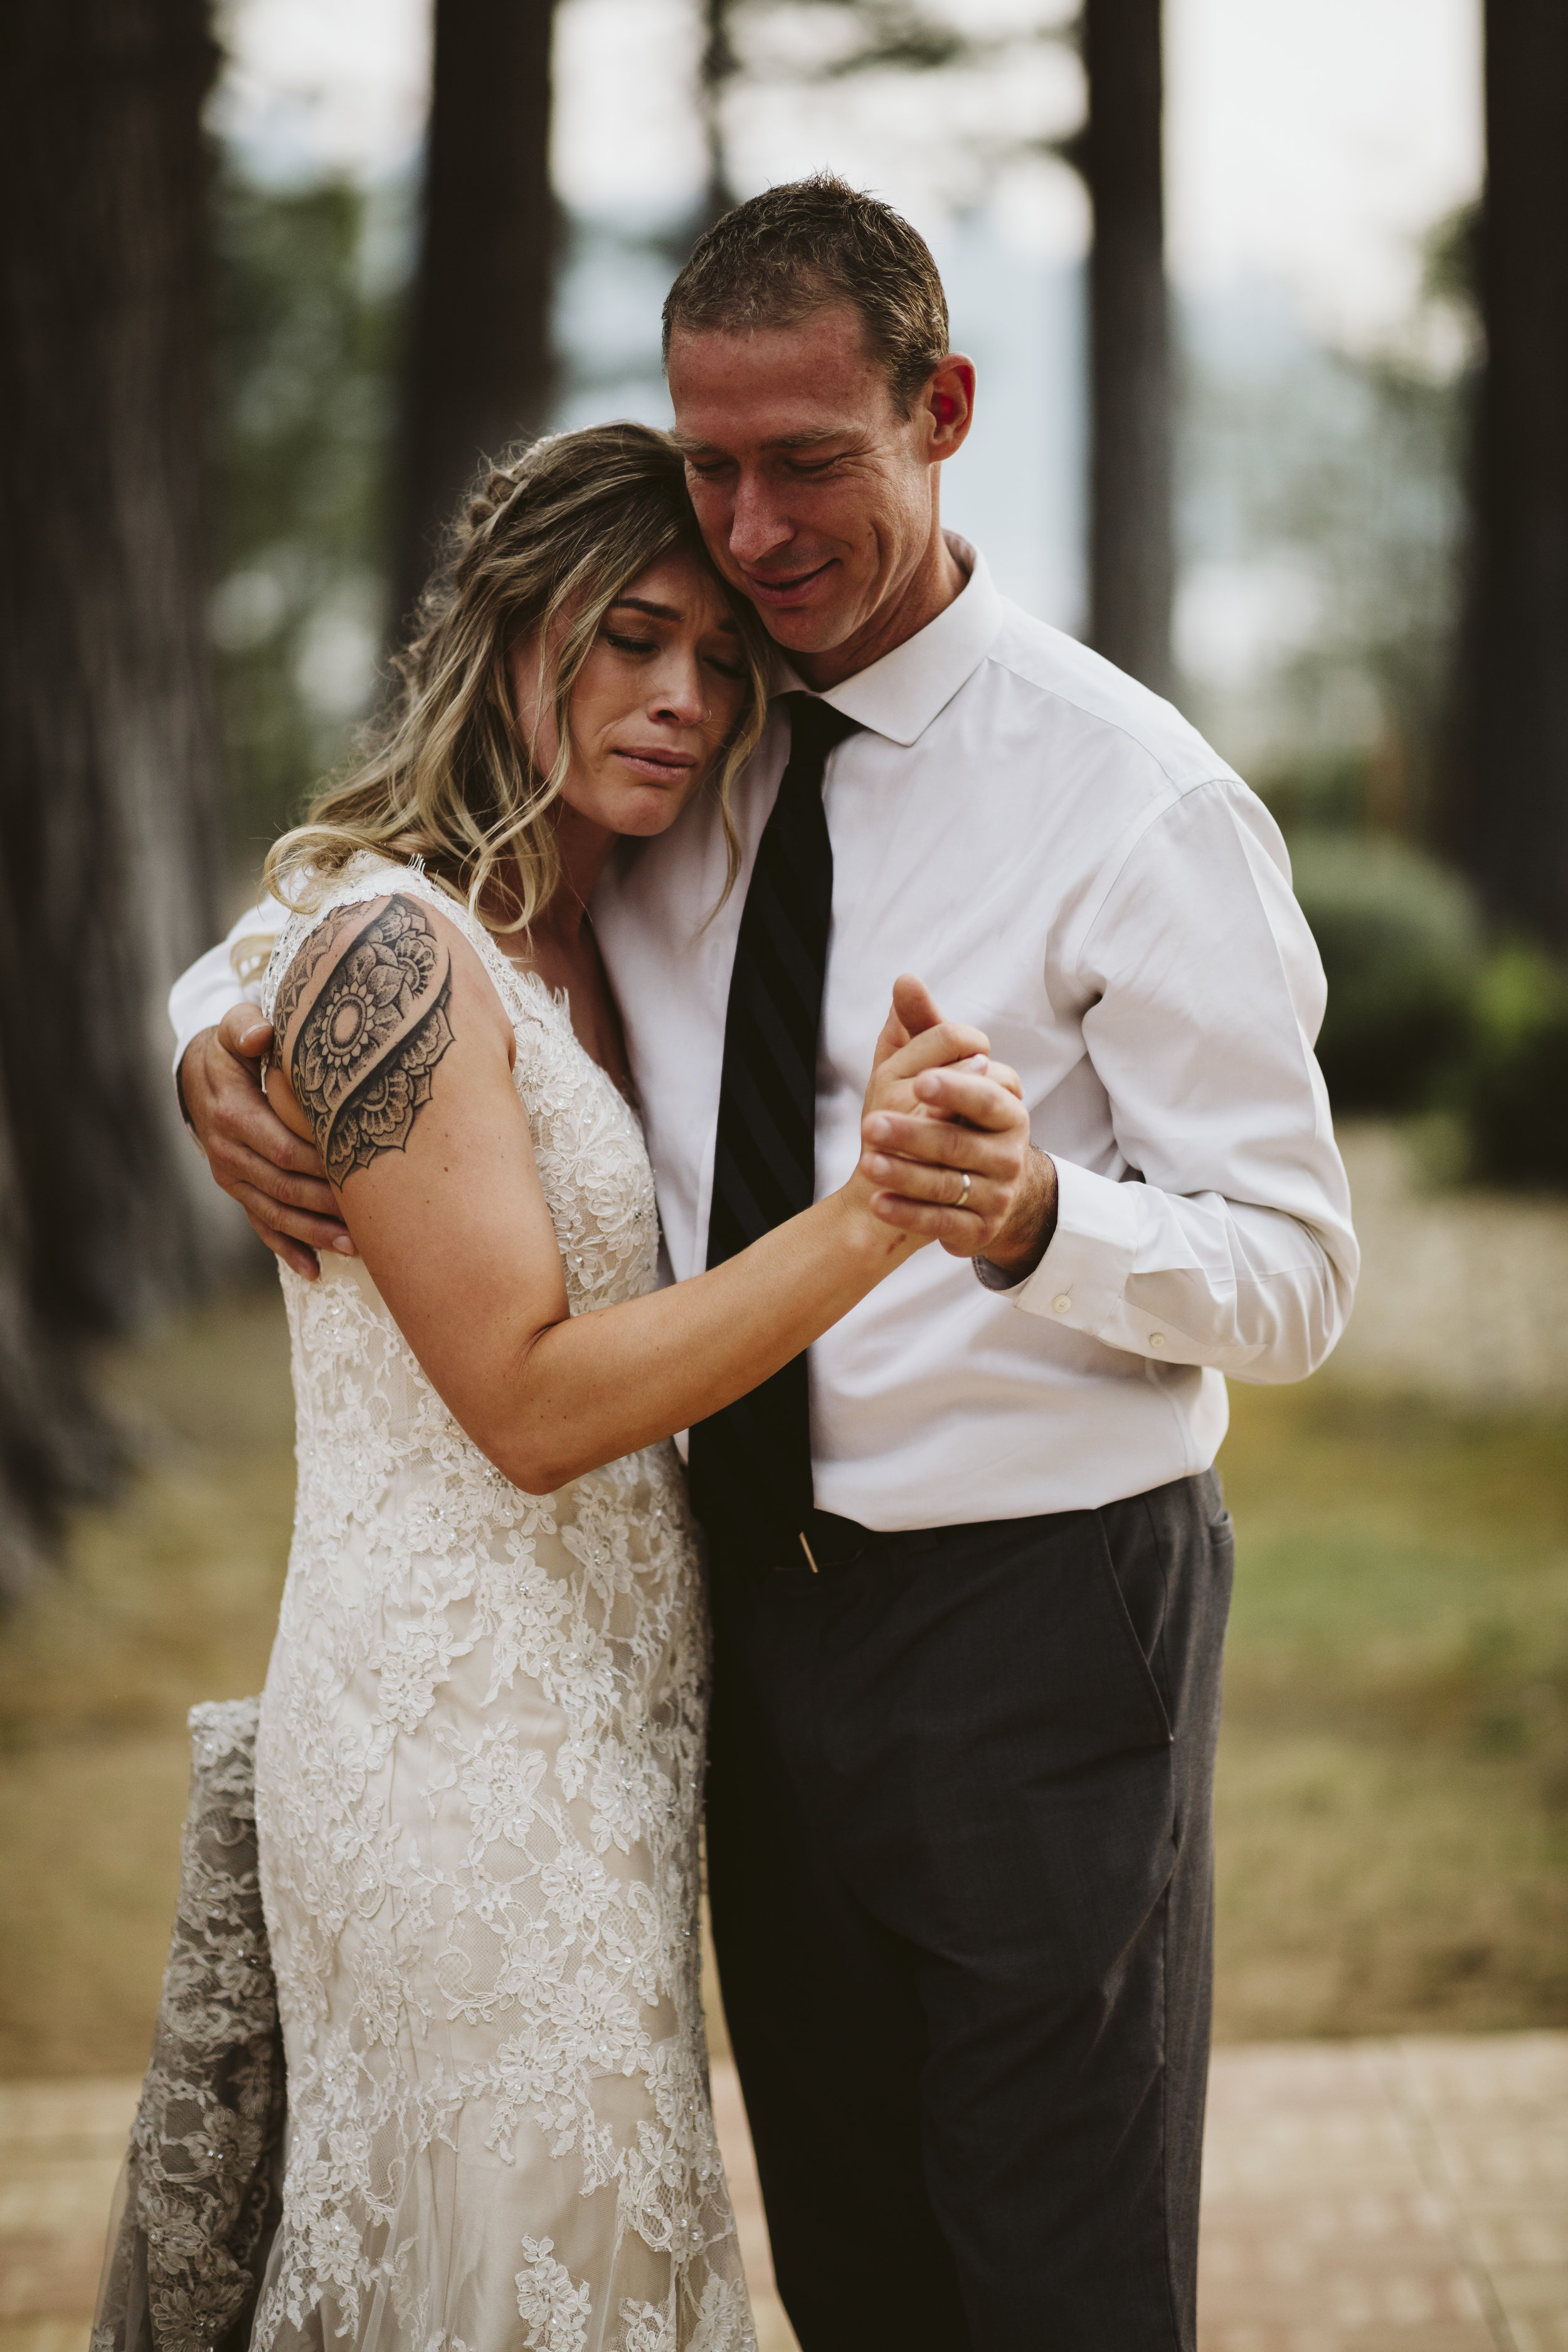 _P8A5191vild-vild photography-photography-wedding-wedding photography-tahoe-lake tahoe-lake tahoe wedding photographer-nevada wedding photographer-mountain wedding.jpg